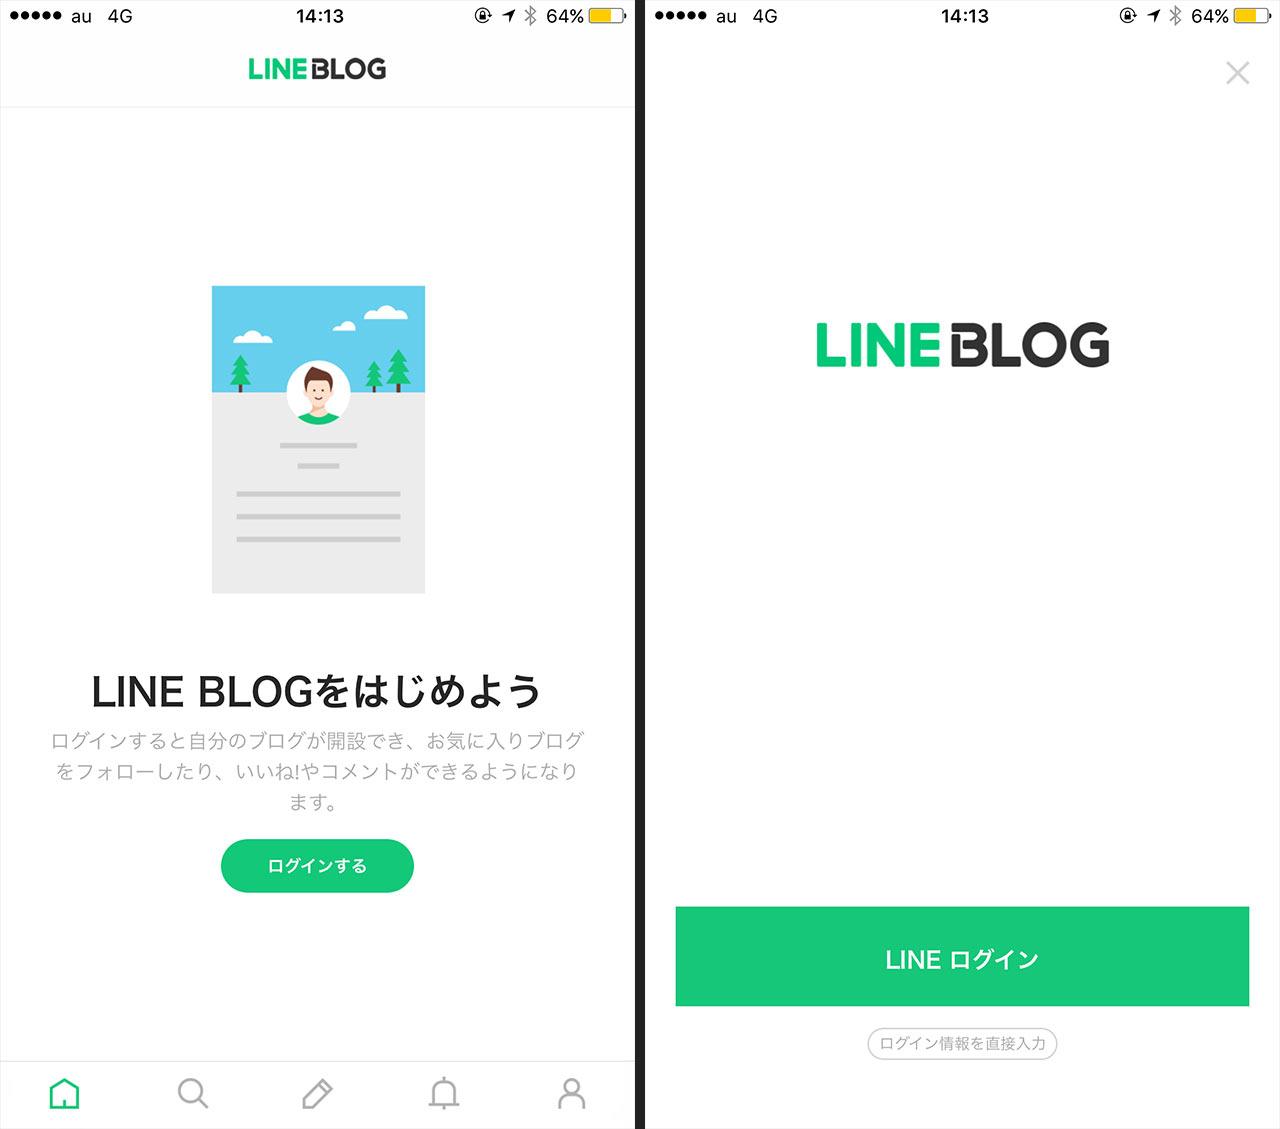 line-blog-01